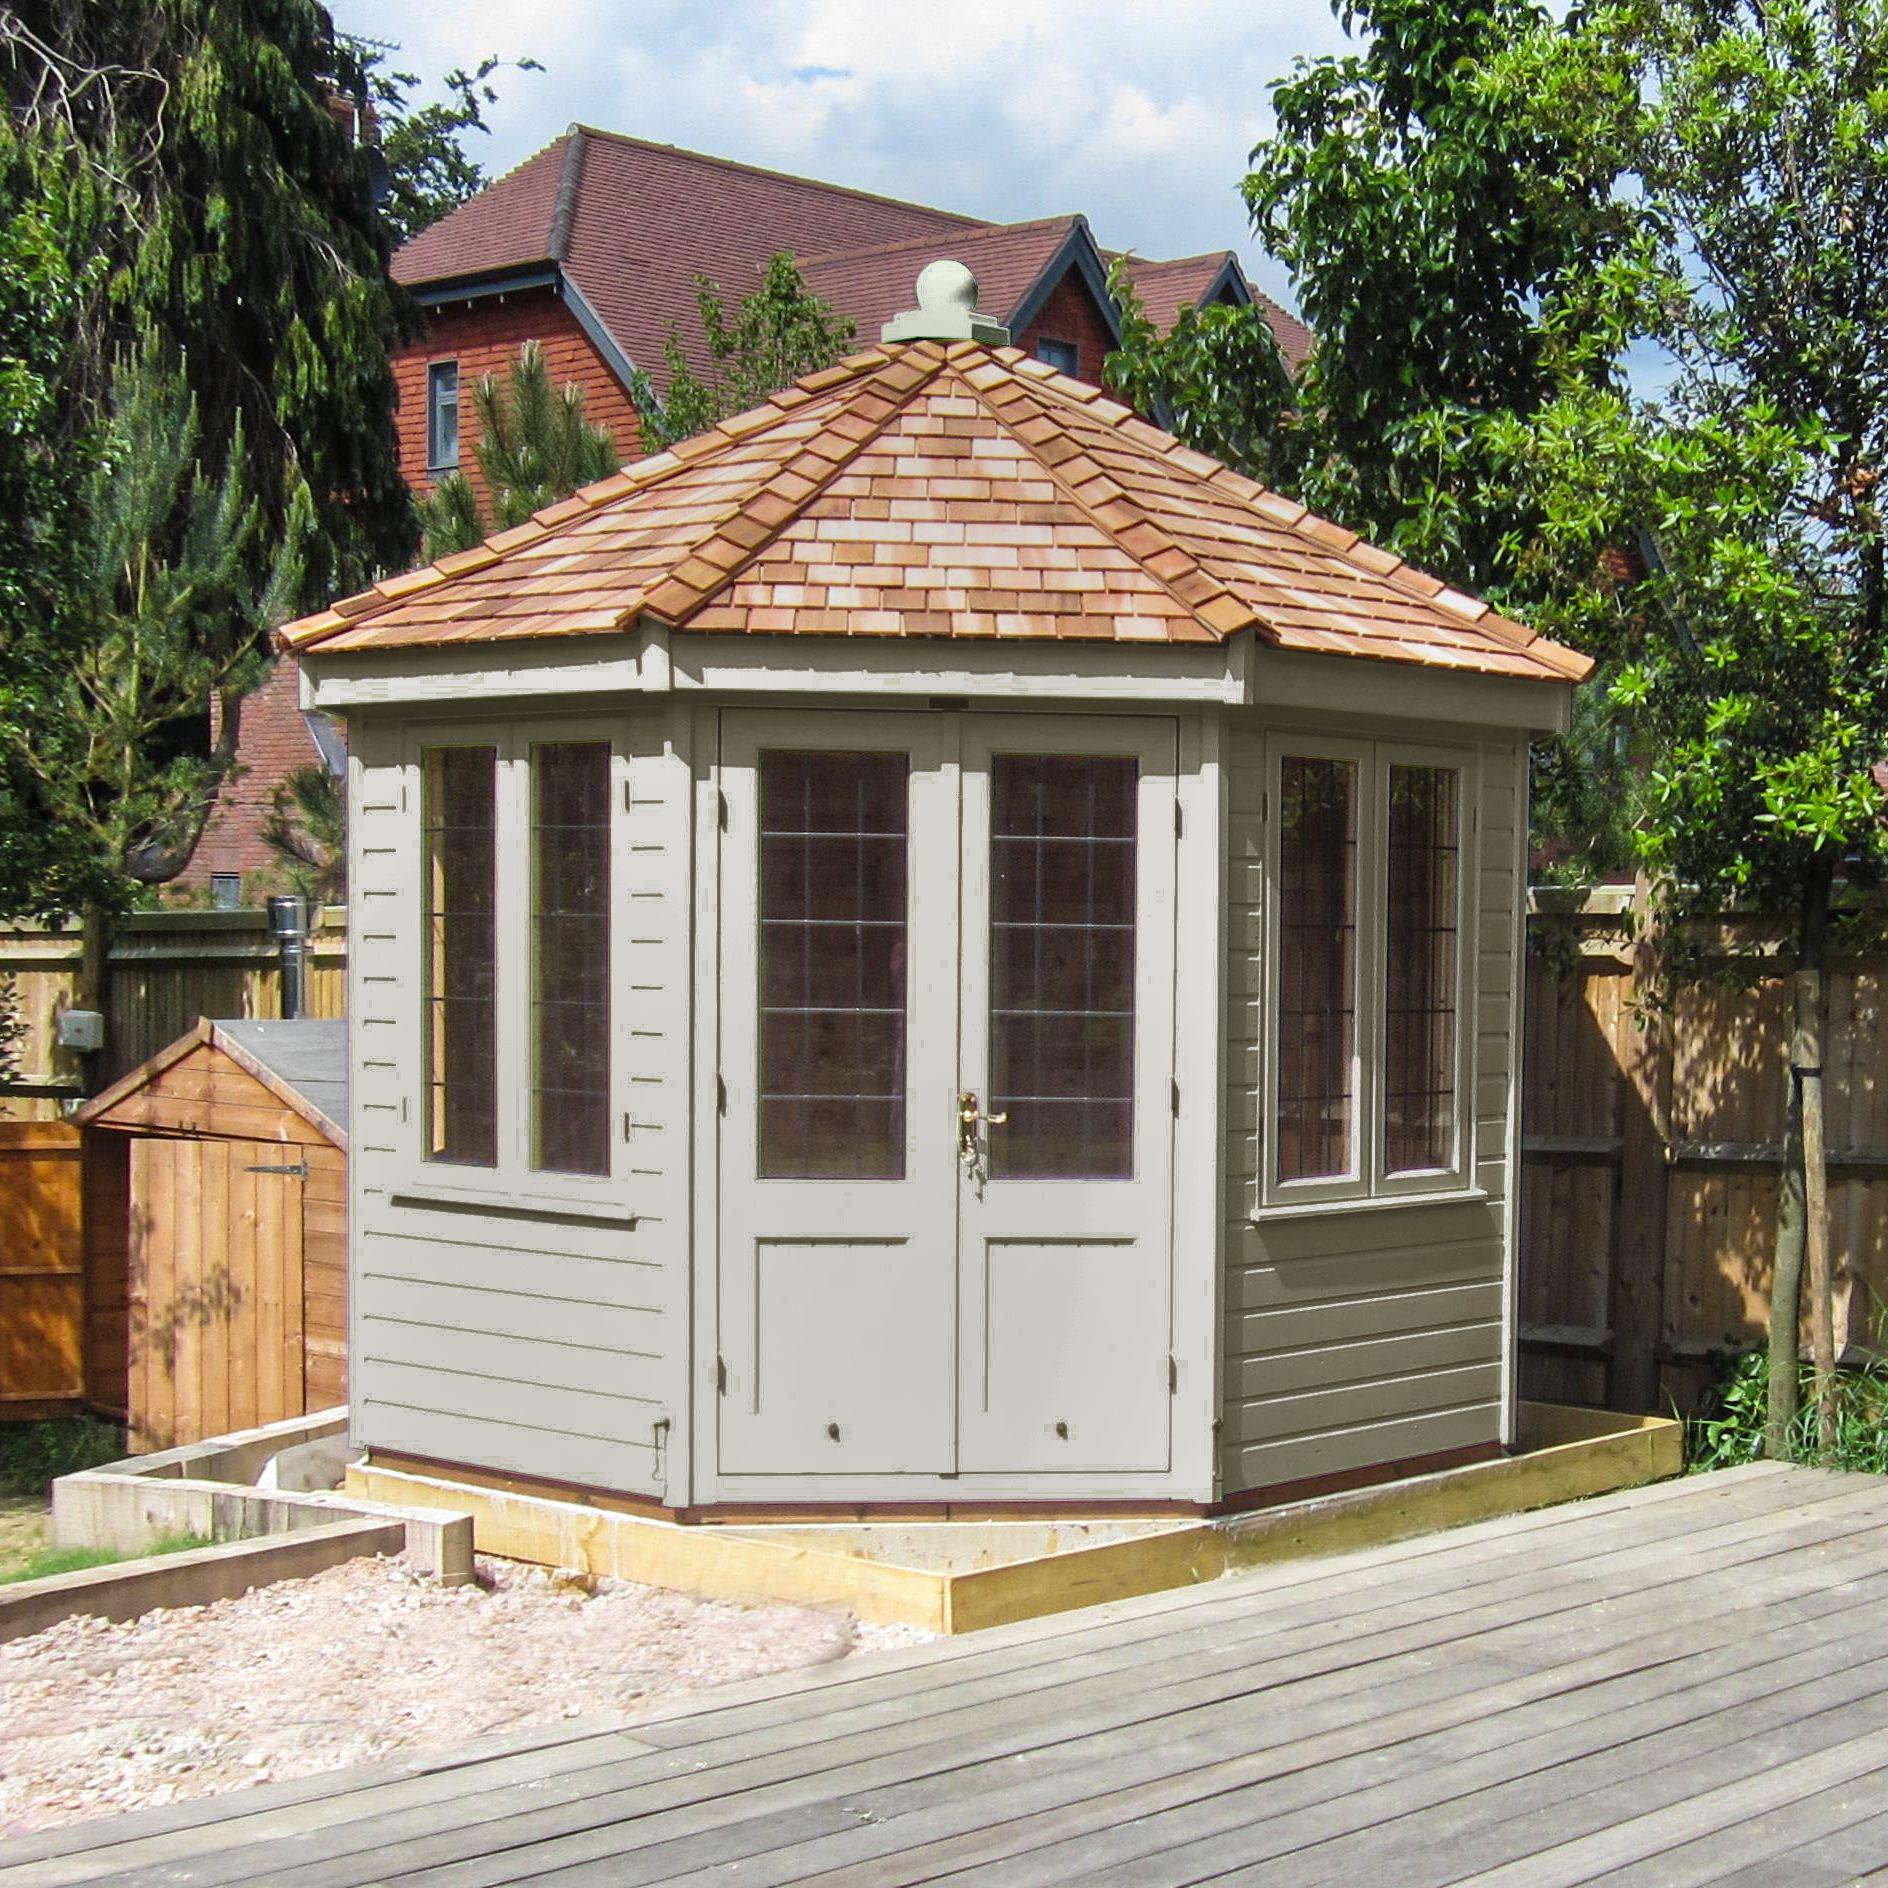 Crane Crane 3 x 3m Round Pavilion Summerhouse, FSC-certified (Scandinavian Redwood)